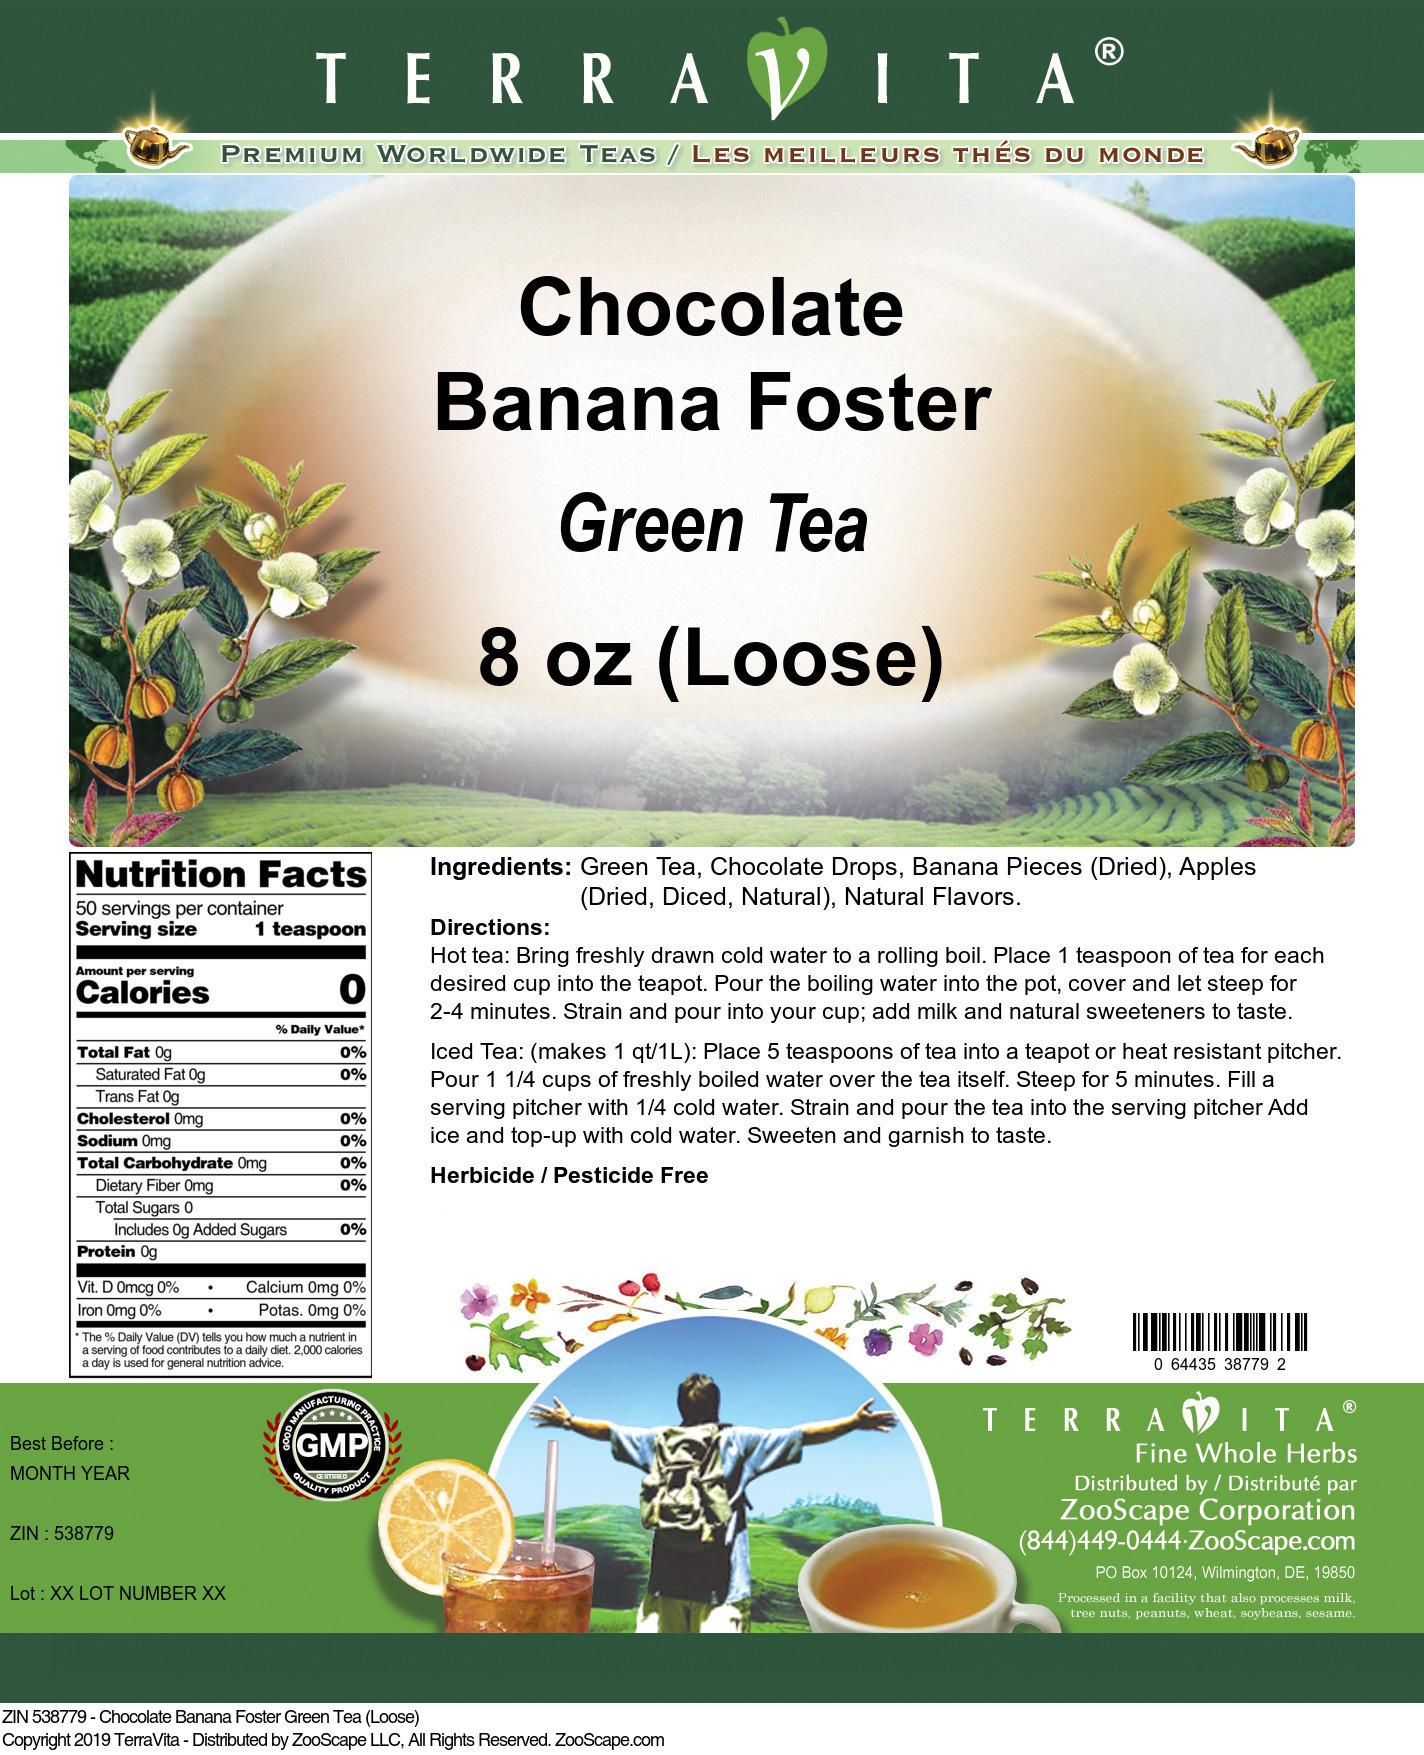 Chocolate Banana Foster Green Tea (Loose)